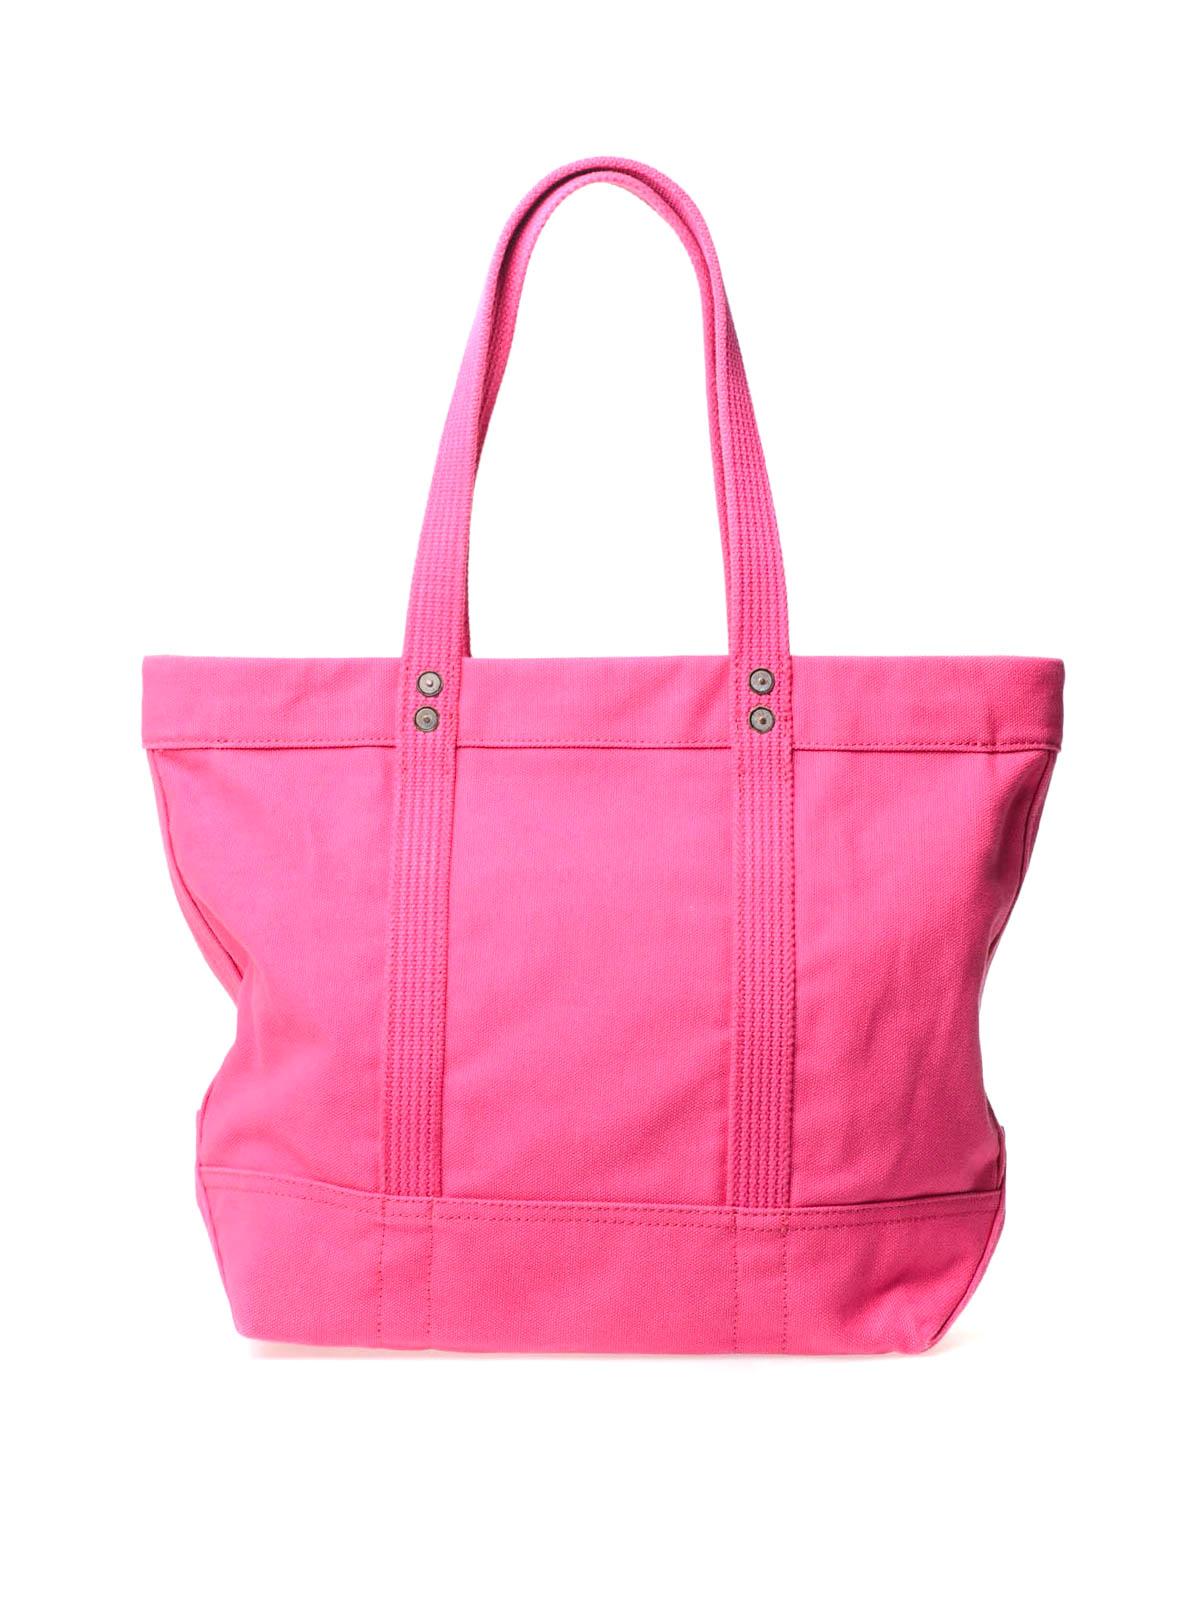 273587851a8f Ralph Lauren - Fabric shopping bag - totes bags - V92IH025 BH117 ...